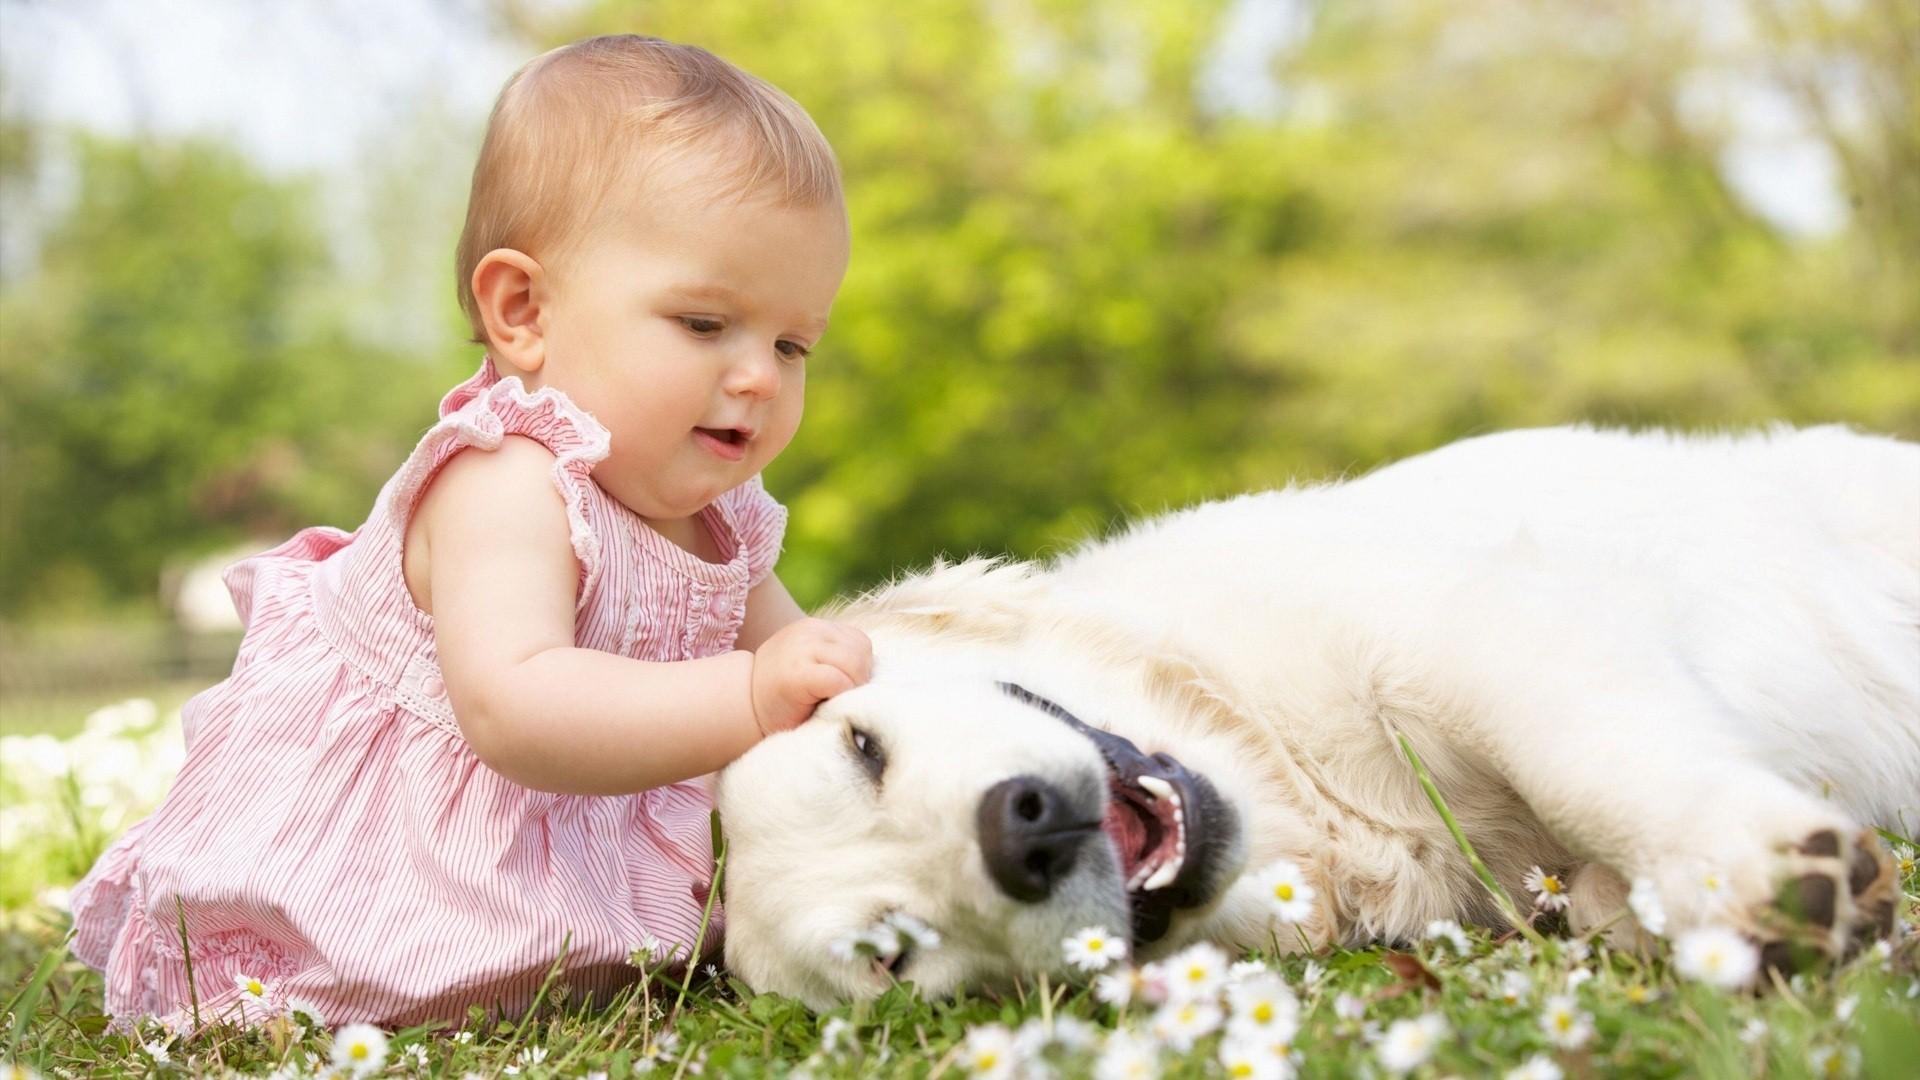 smiling cute babies wallpaper (62+ images)